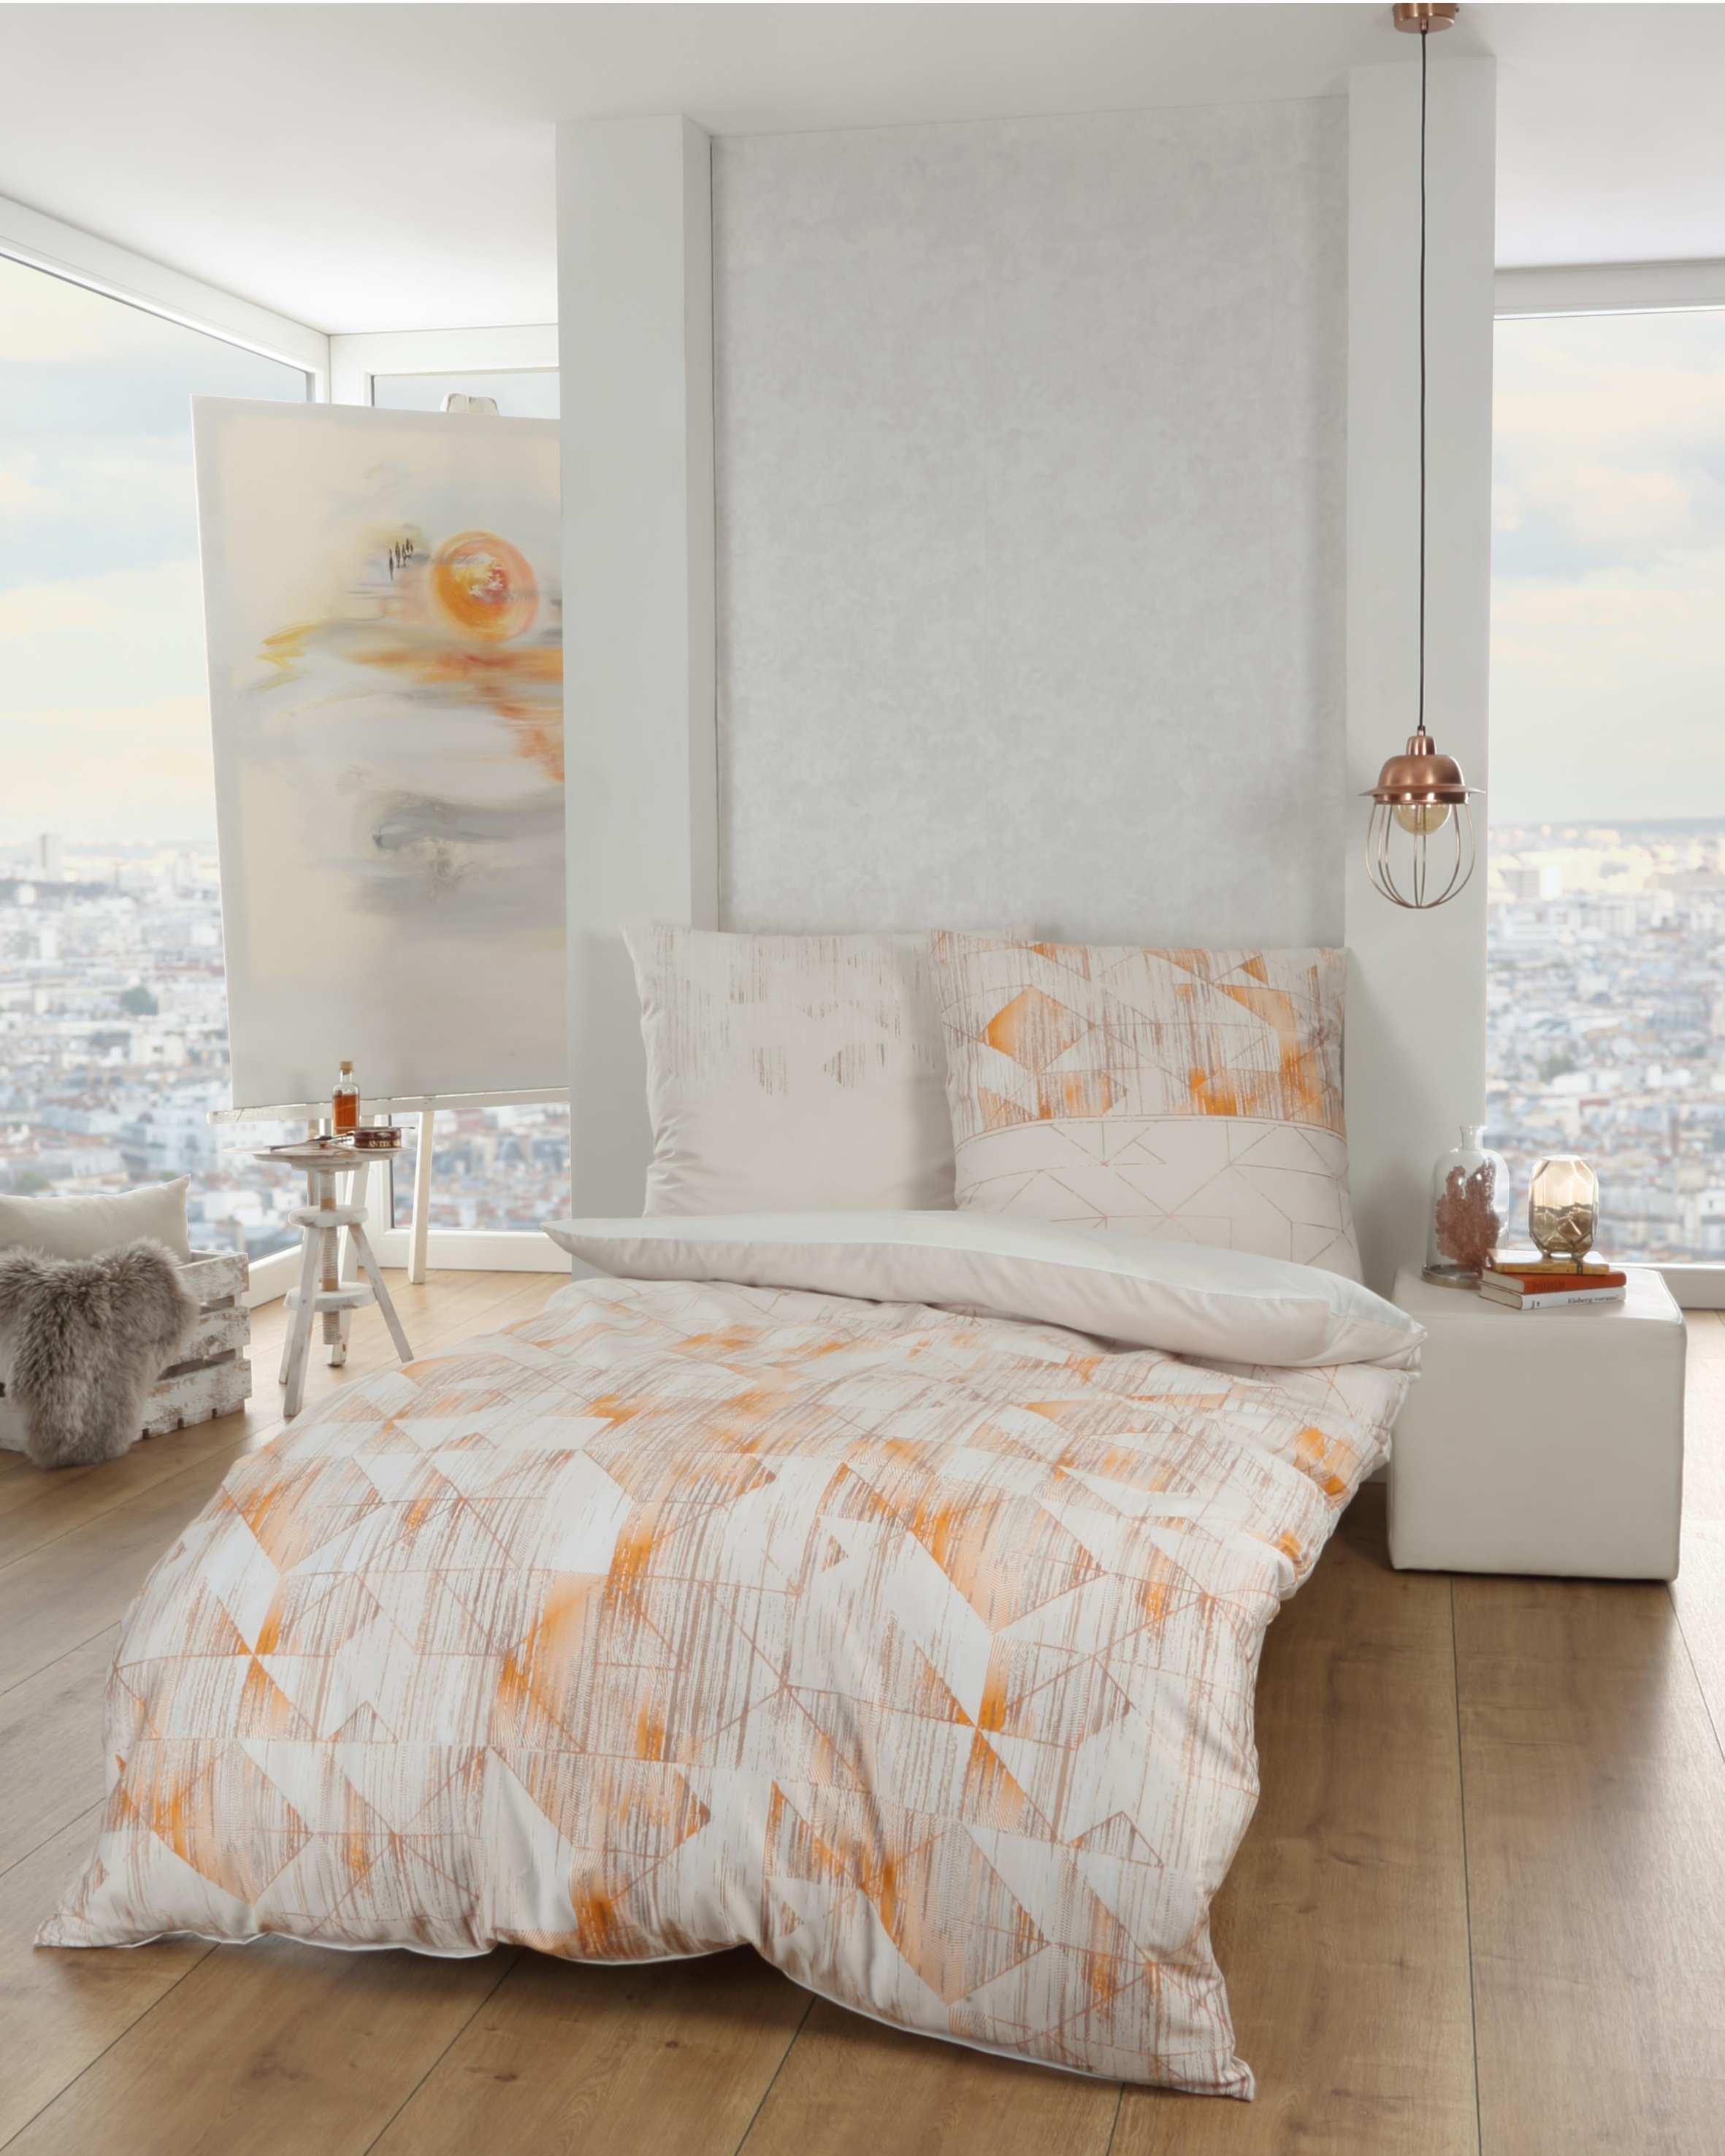 mako satin bettw sche kaeppel 831 farbton mandarine g nstig. Black Bedroom Furniture Sets. Home Design Ideas